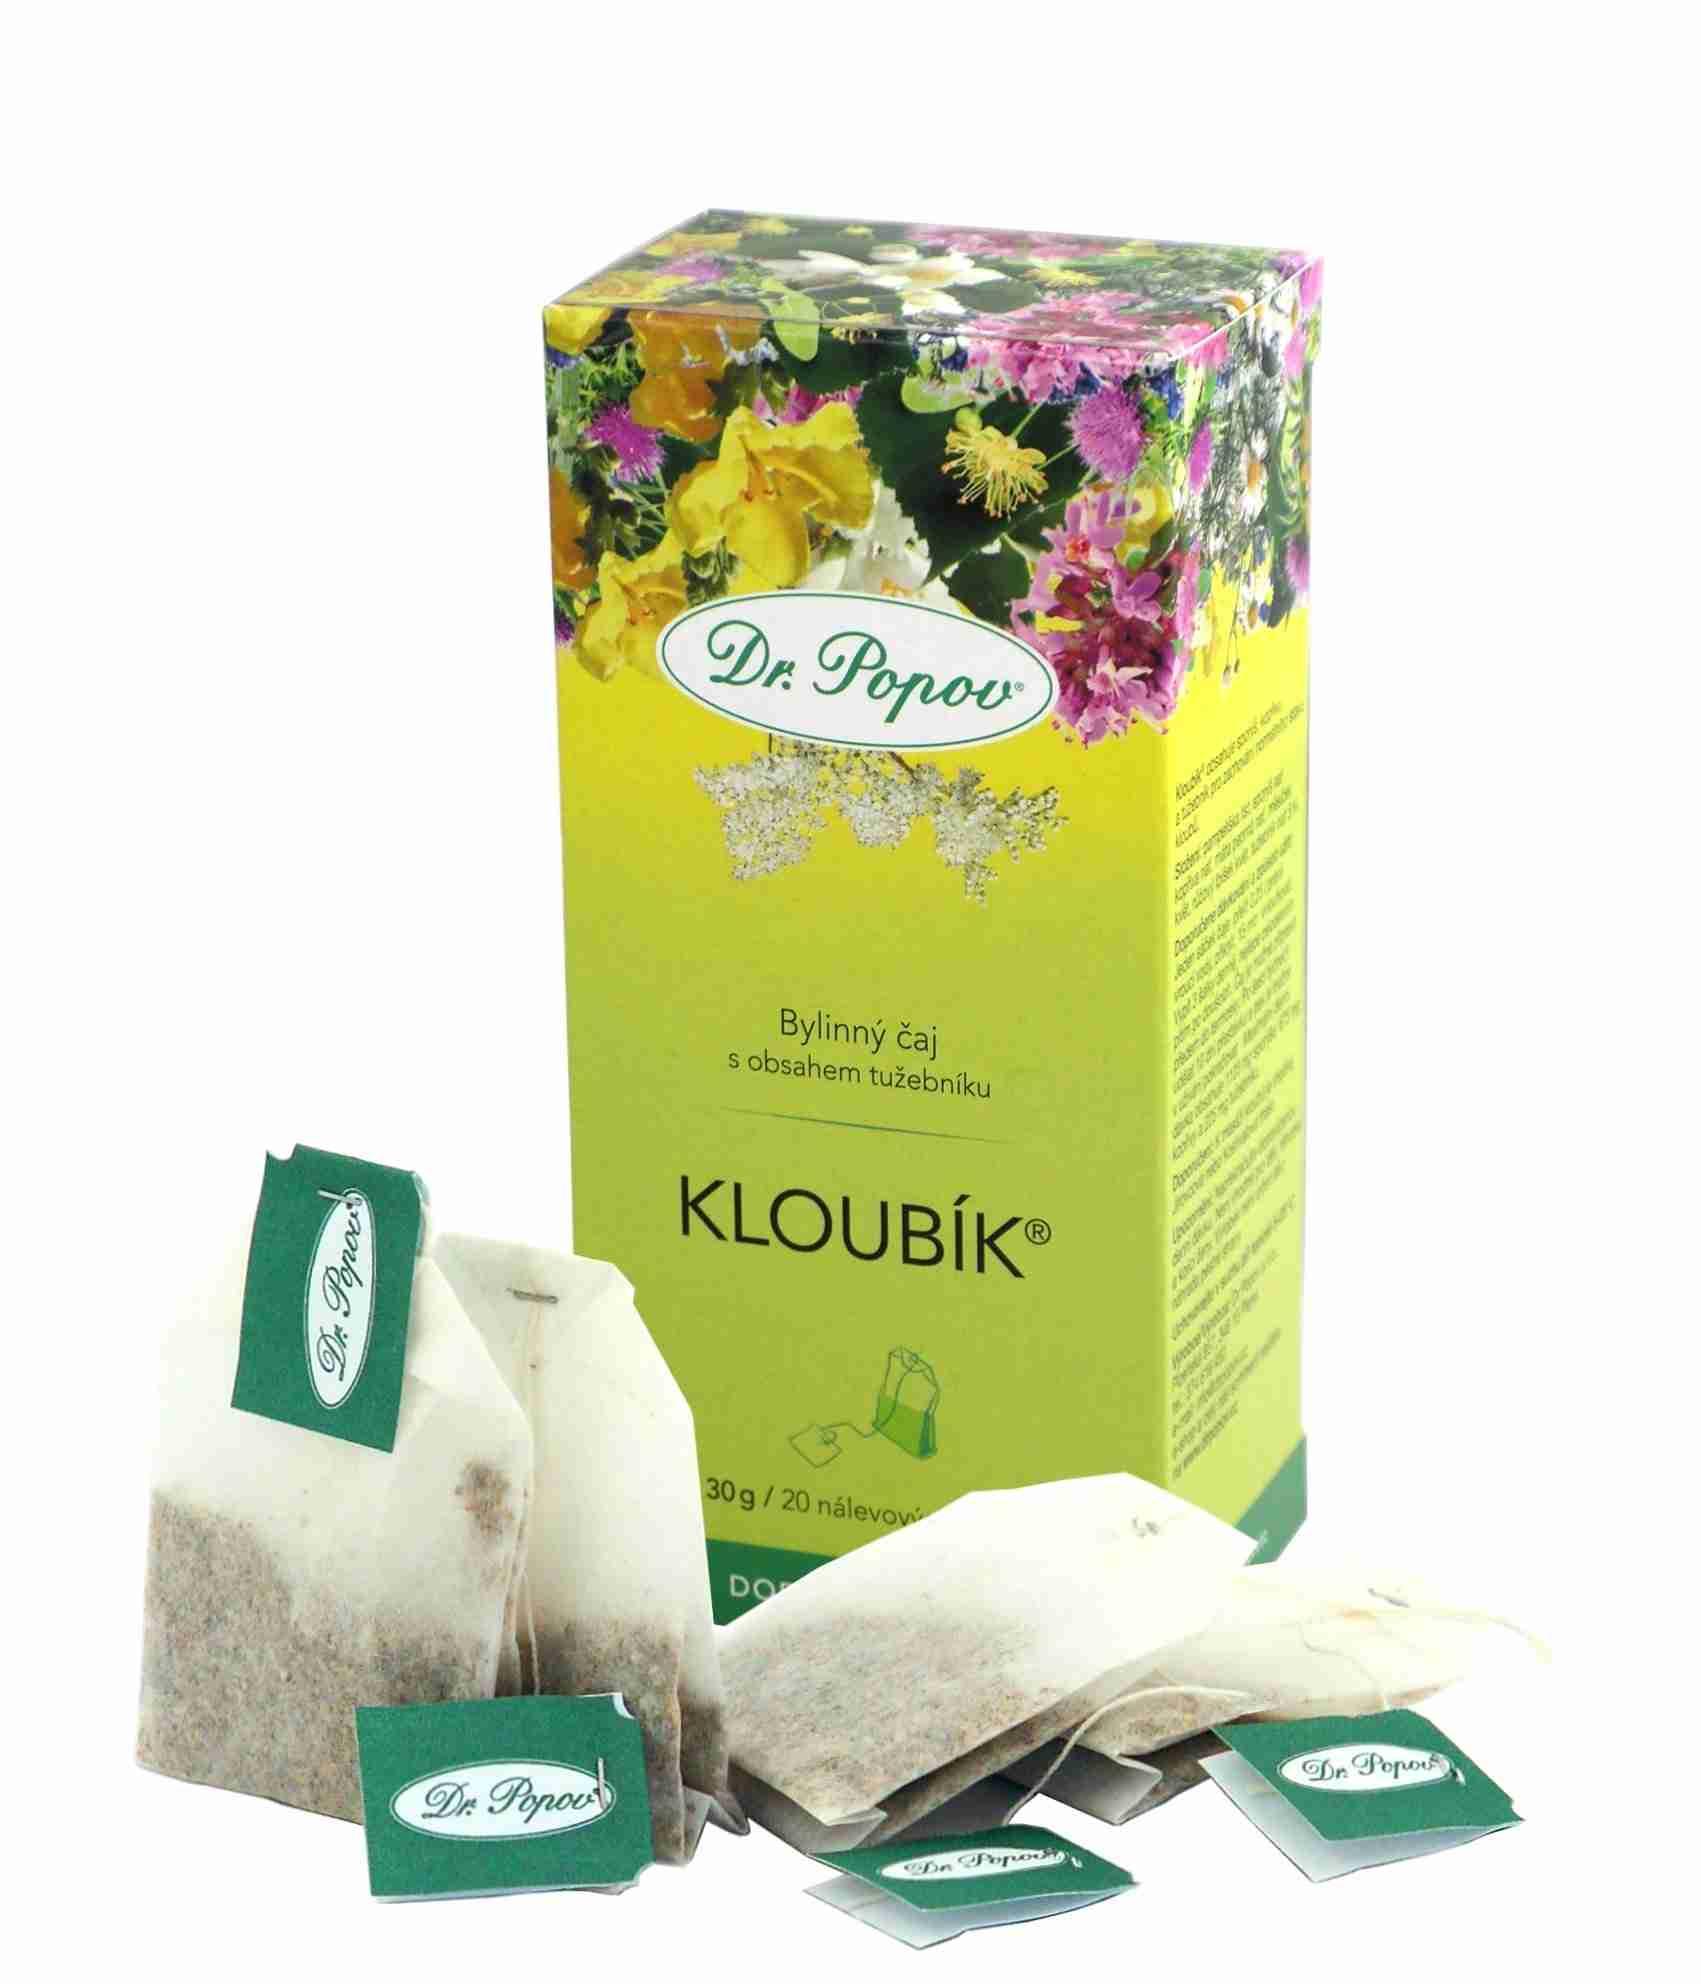 Dr. Popov Kloubik 20 n.s.